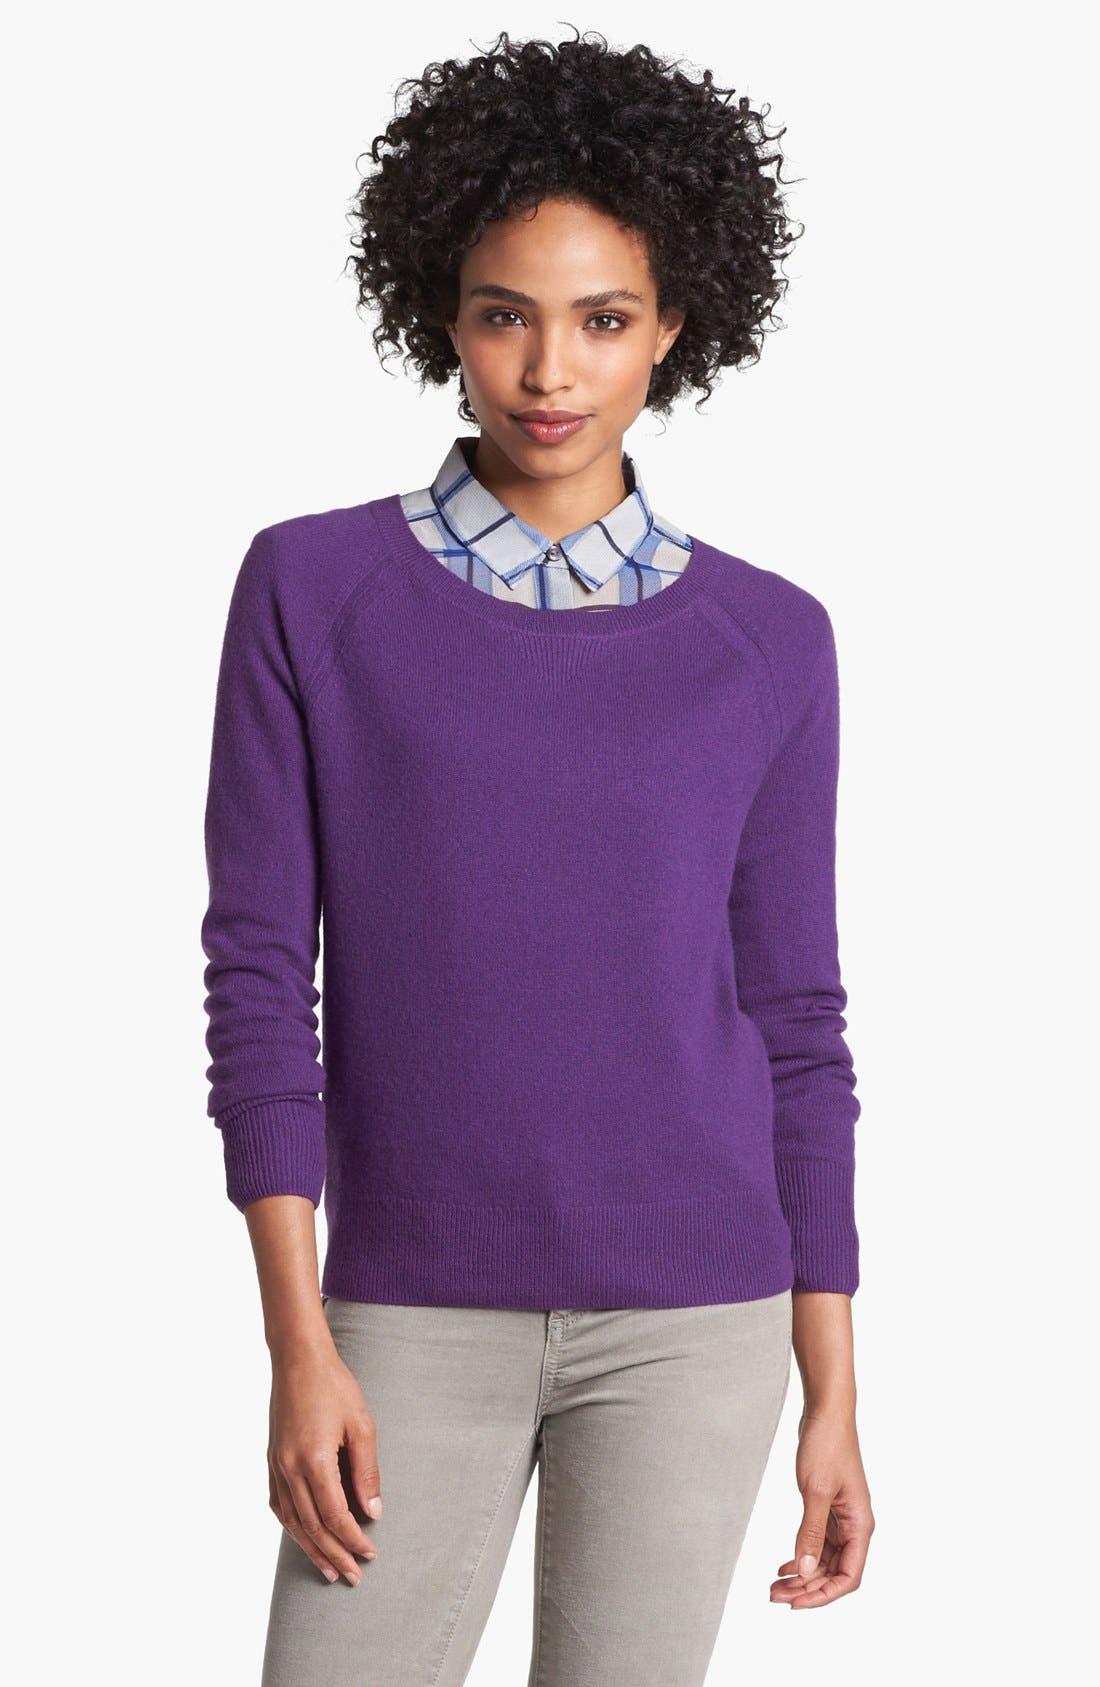 Alternate Image 1 Selected - Halogen® Raglan Sleeve Cashmere Sweater (Petite)